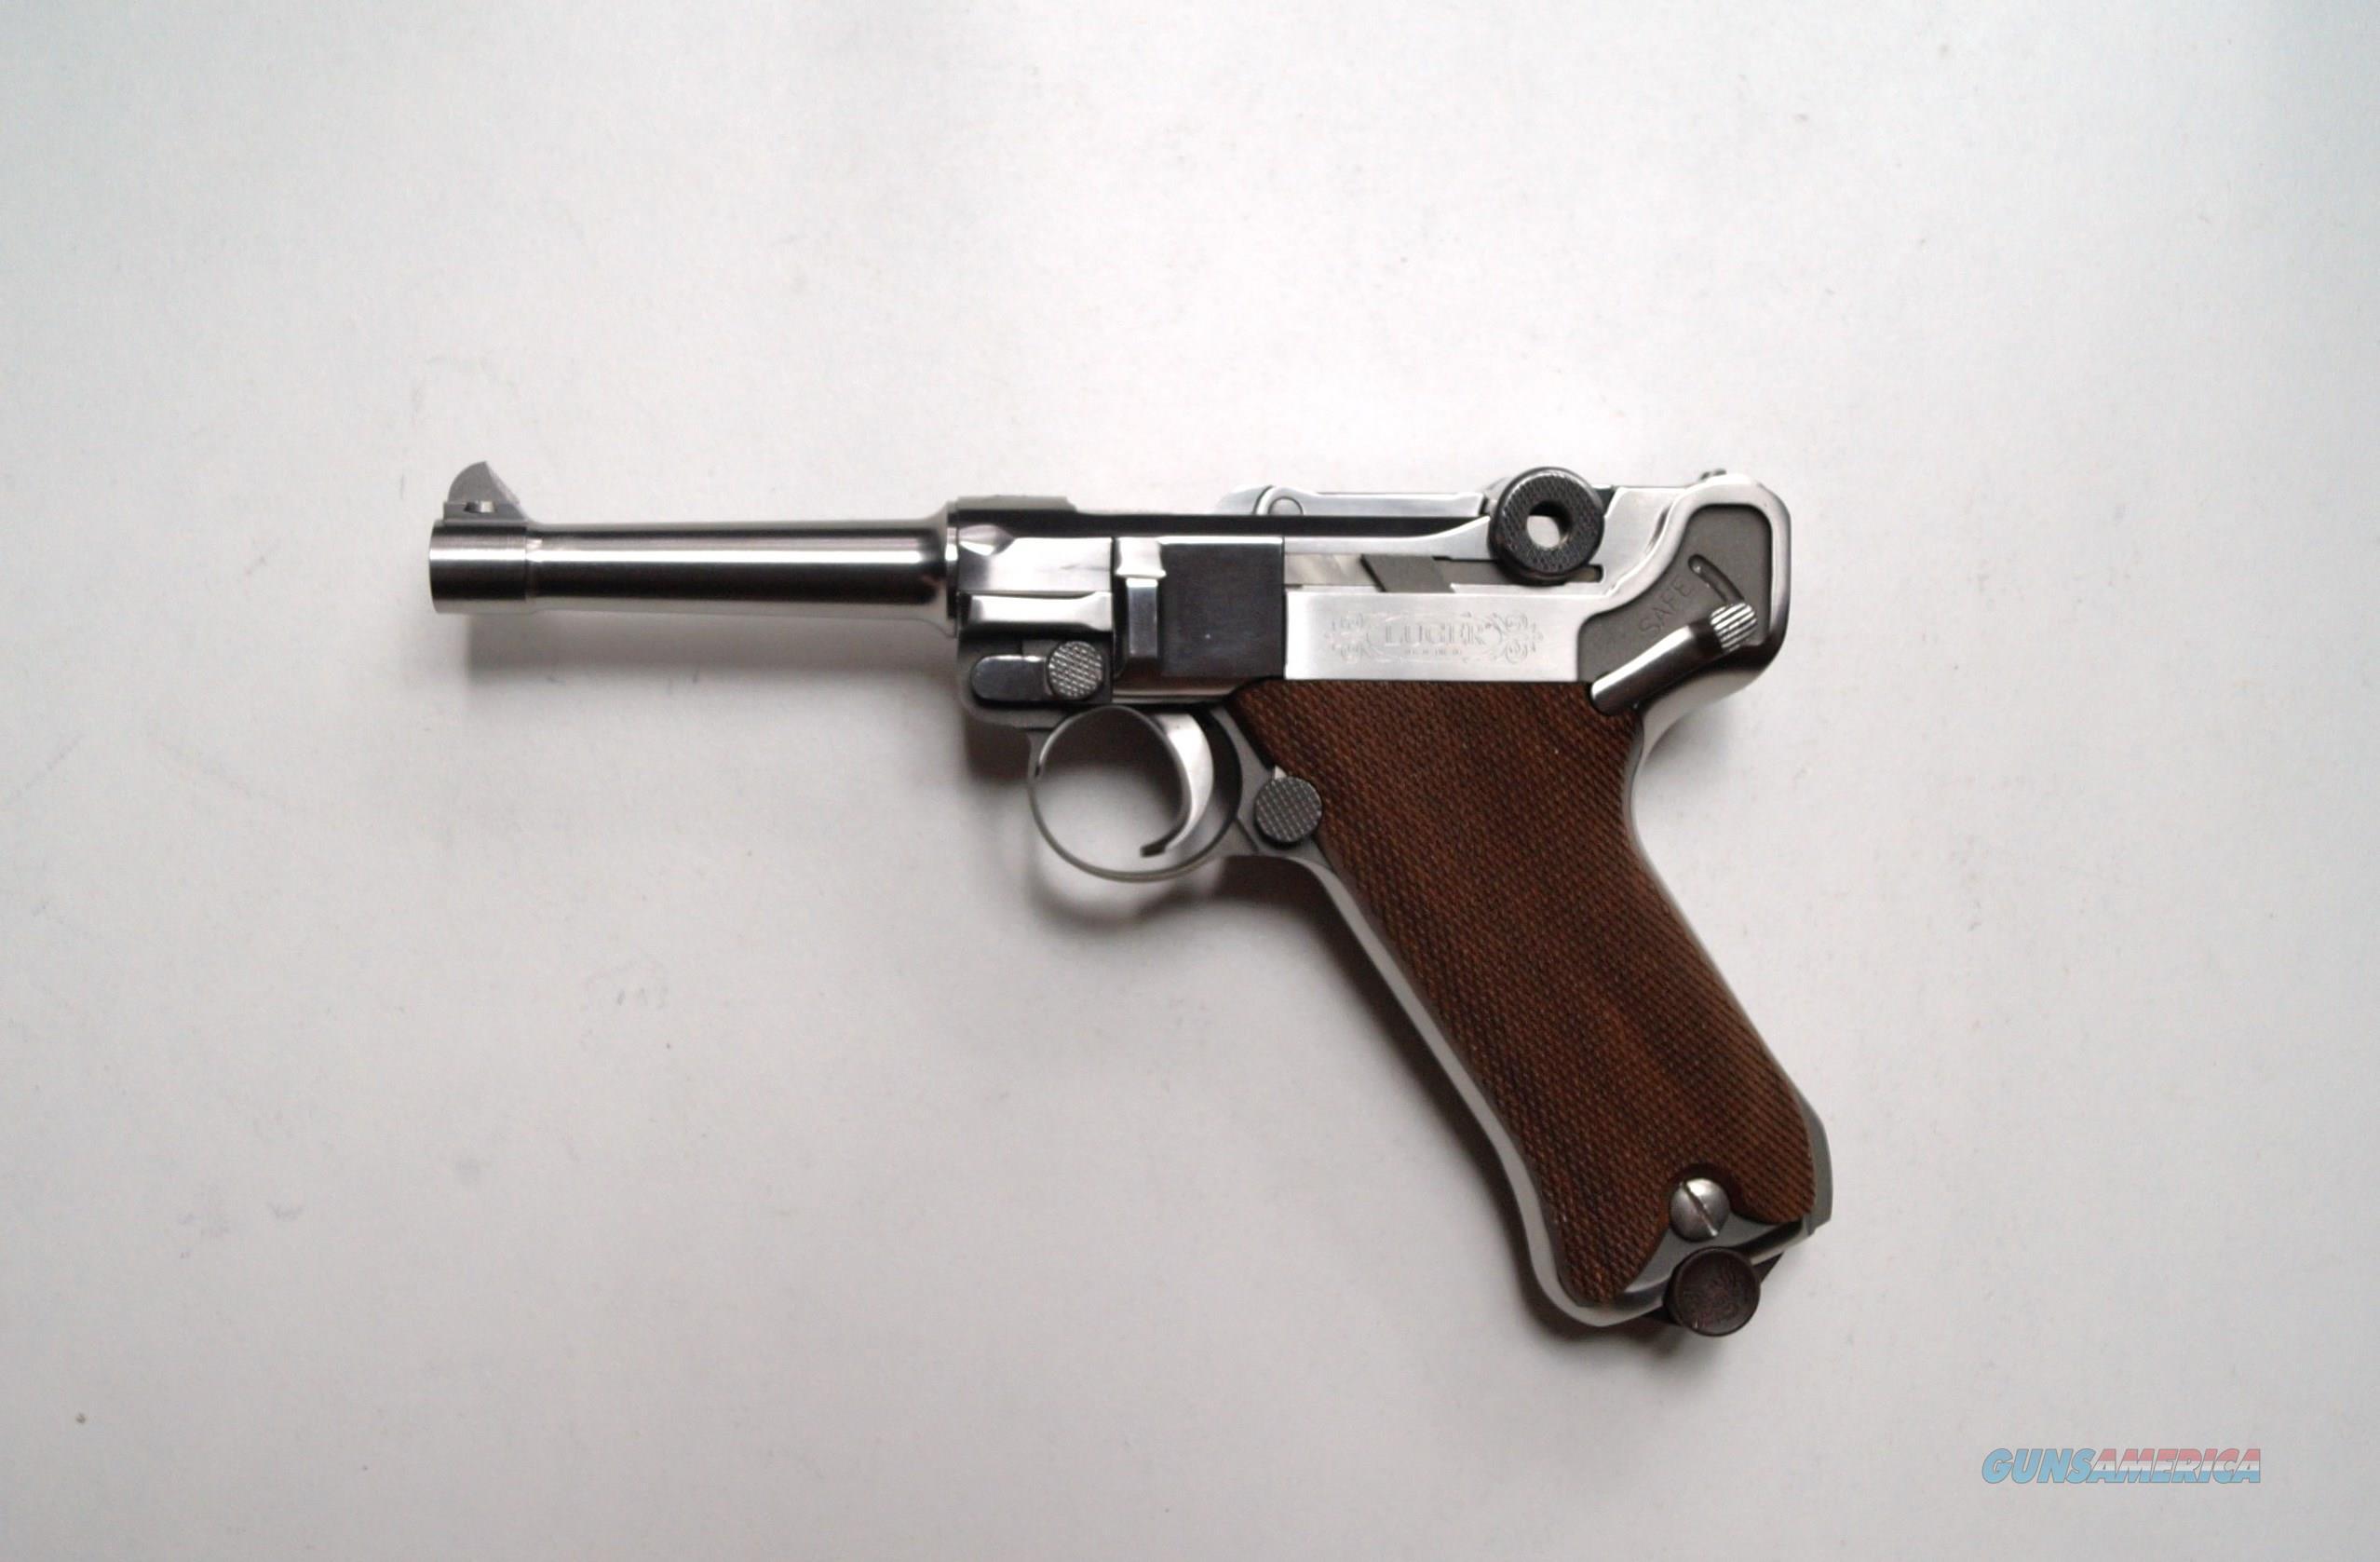 STOEGER AMERICAN EAGLE LUGER / MINT  Guns > Pistols > Luger Pistols